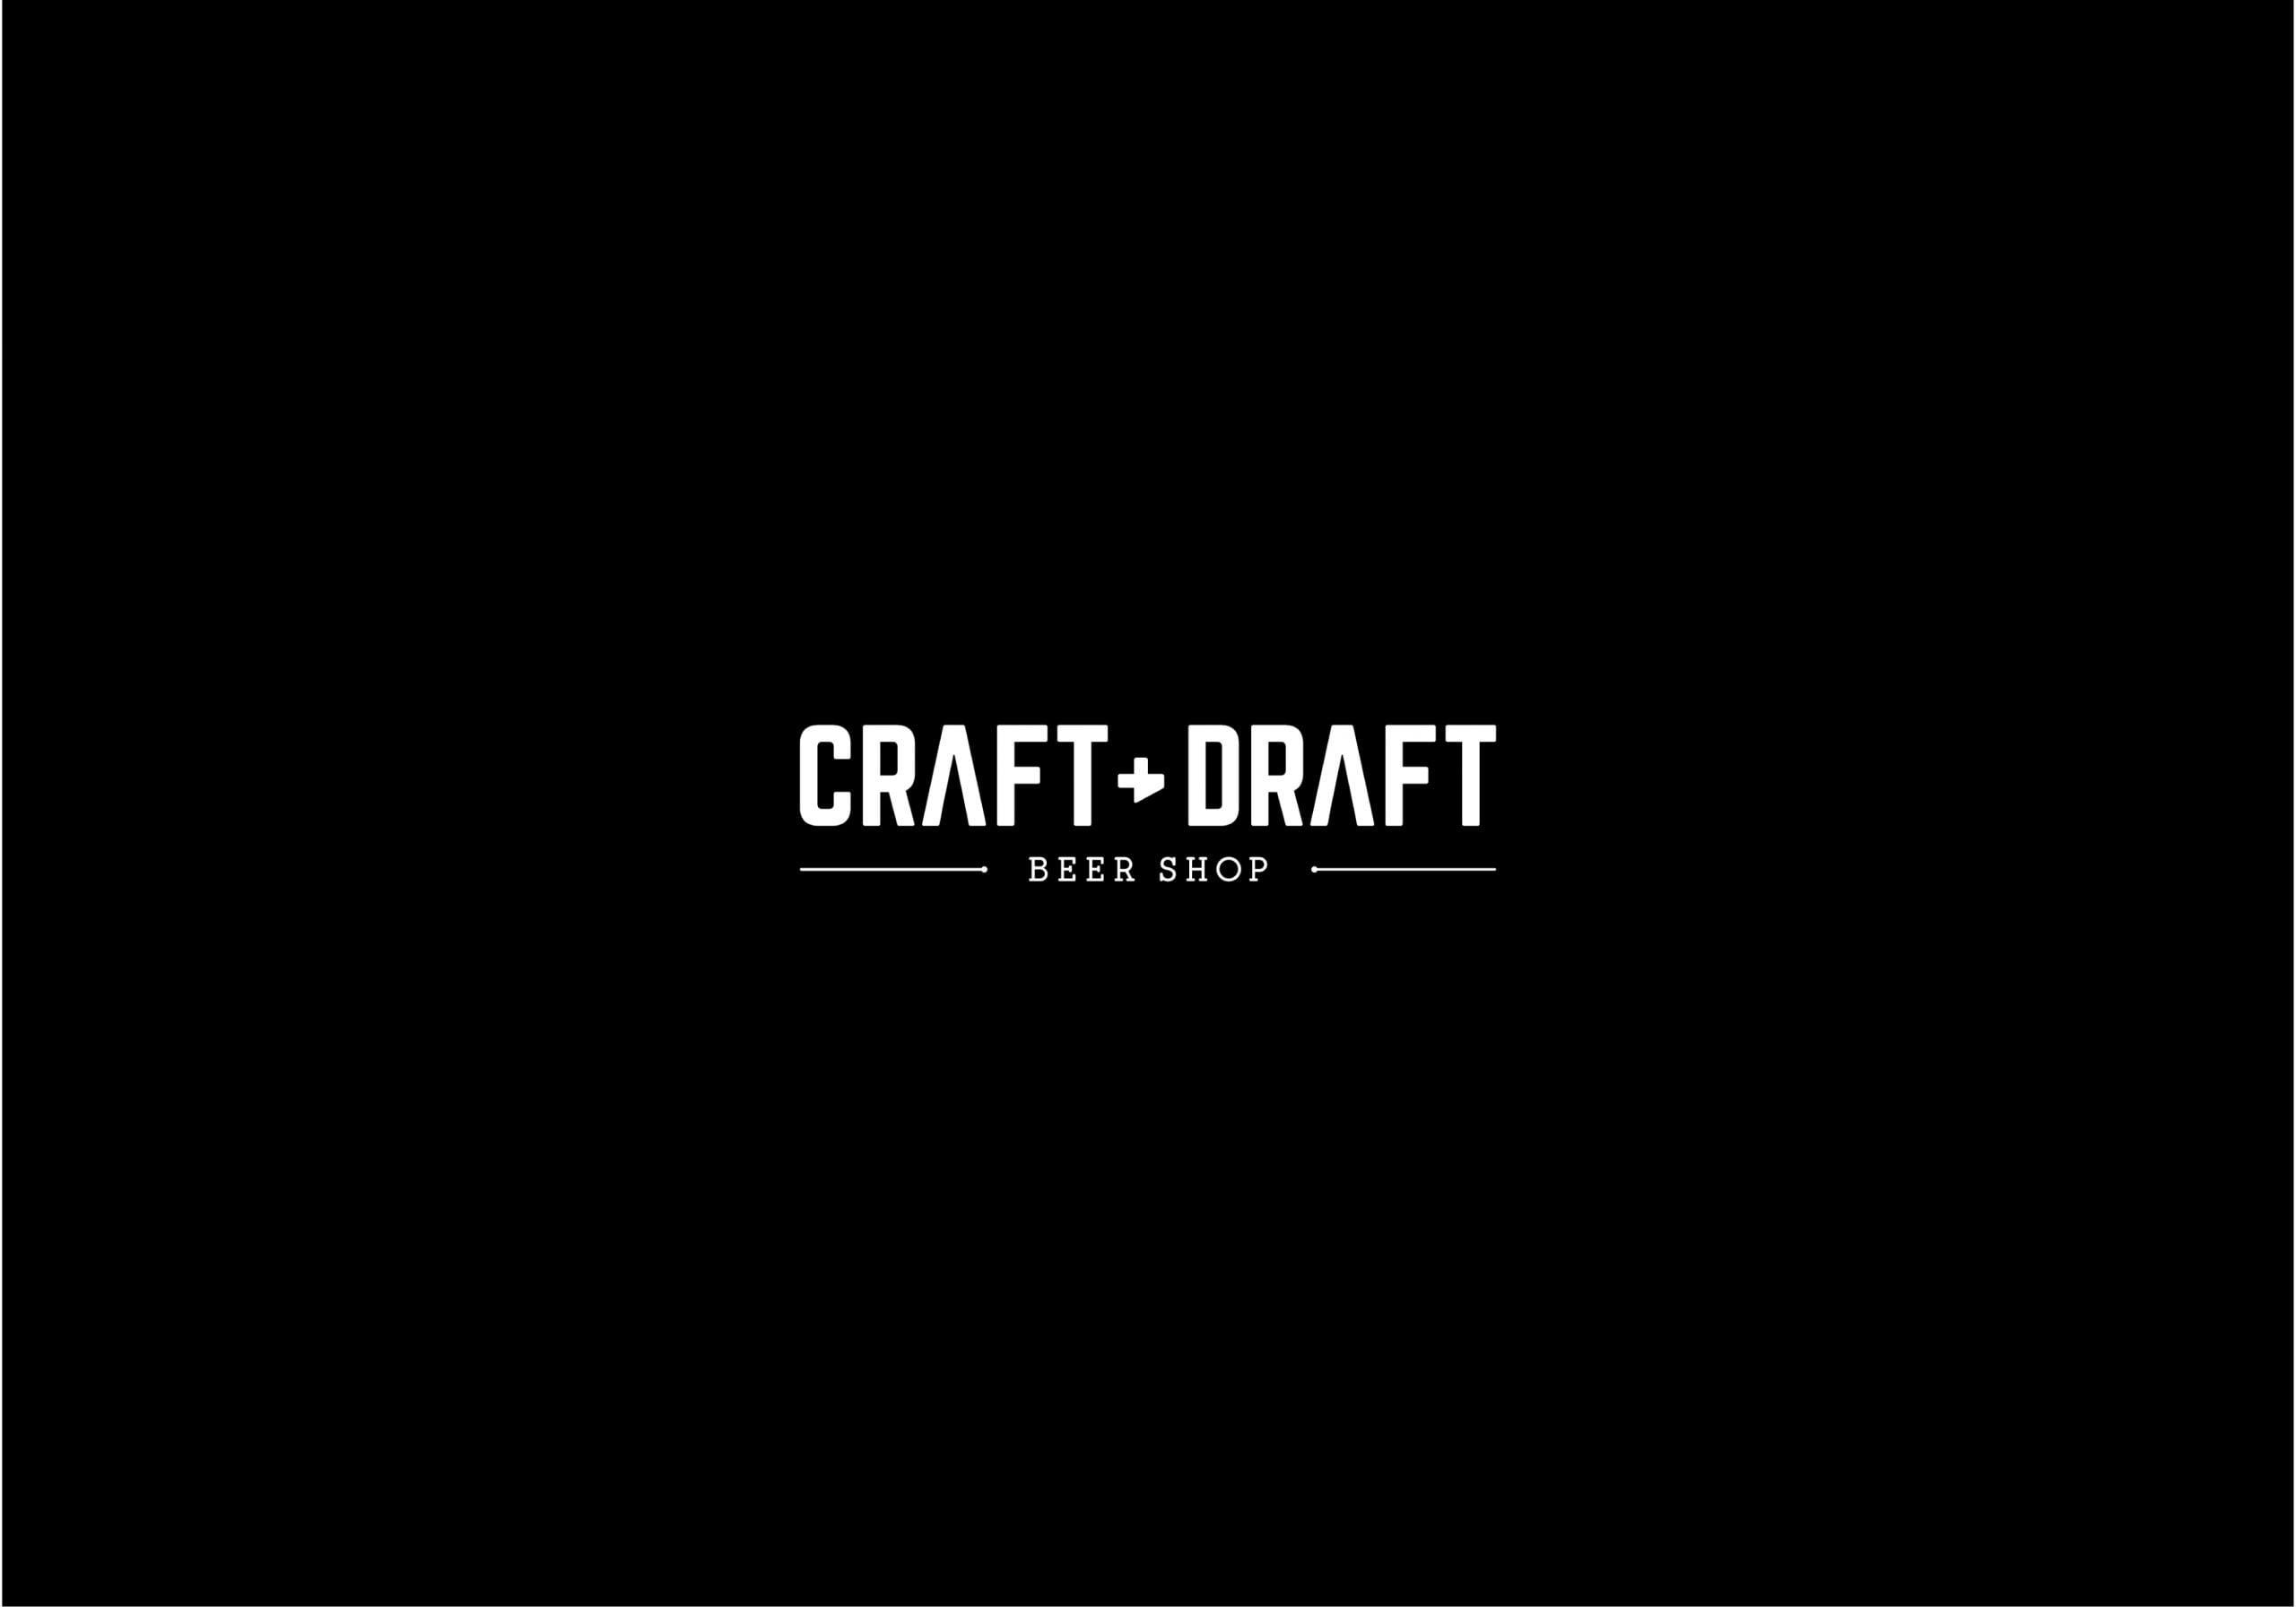 Craft & Draft